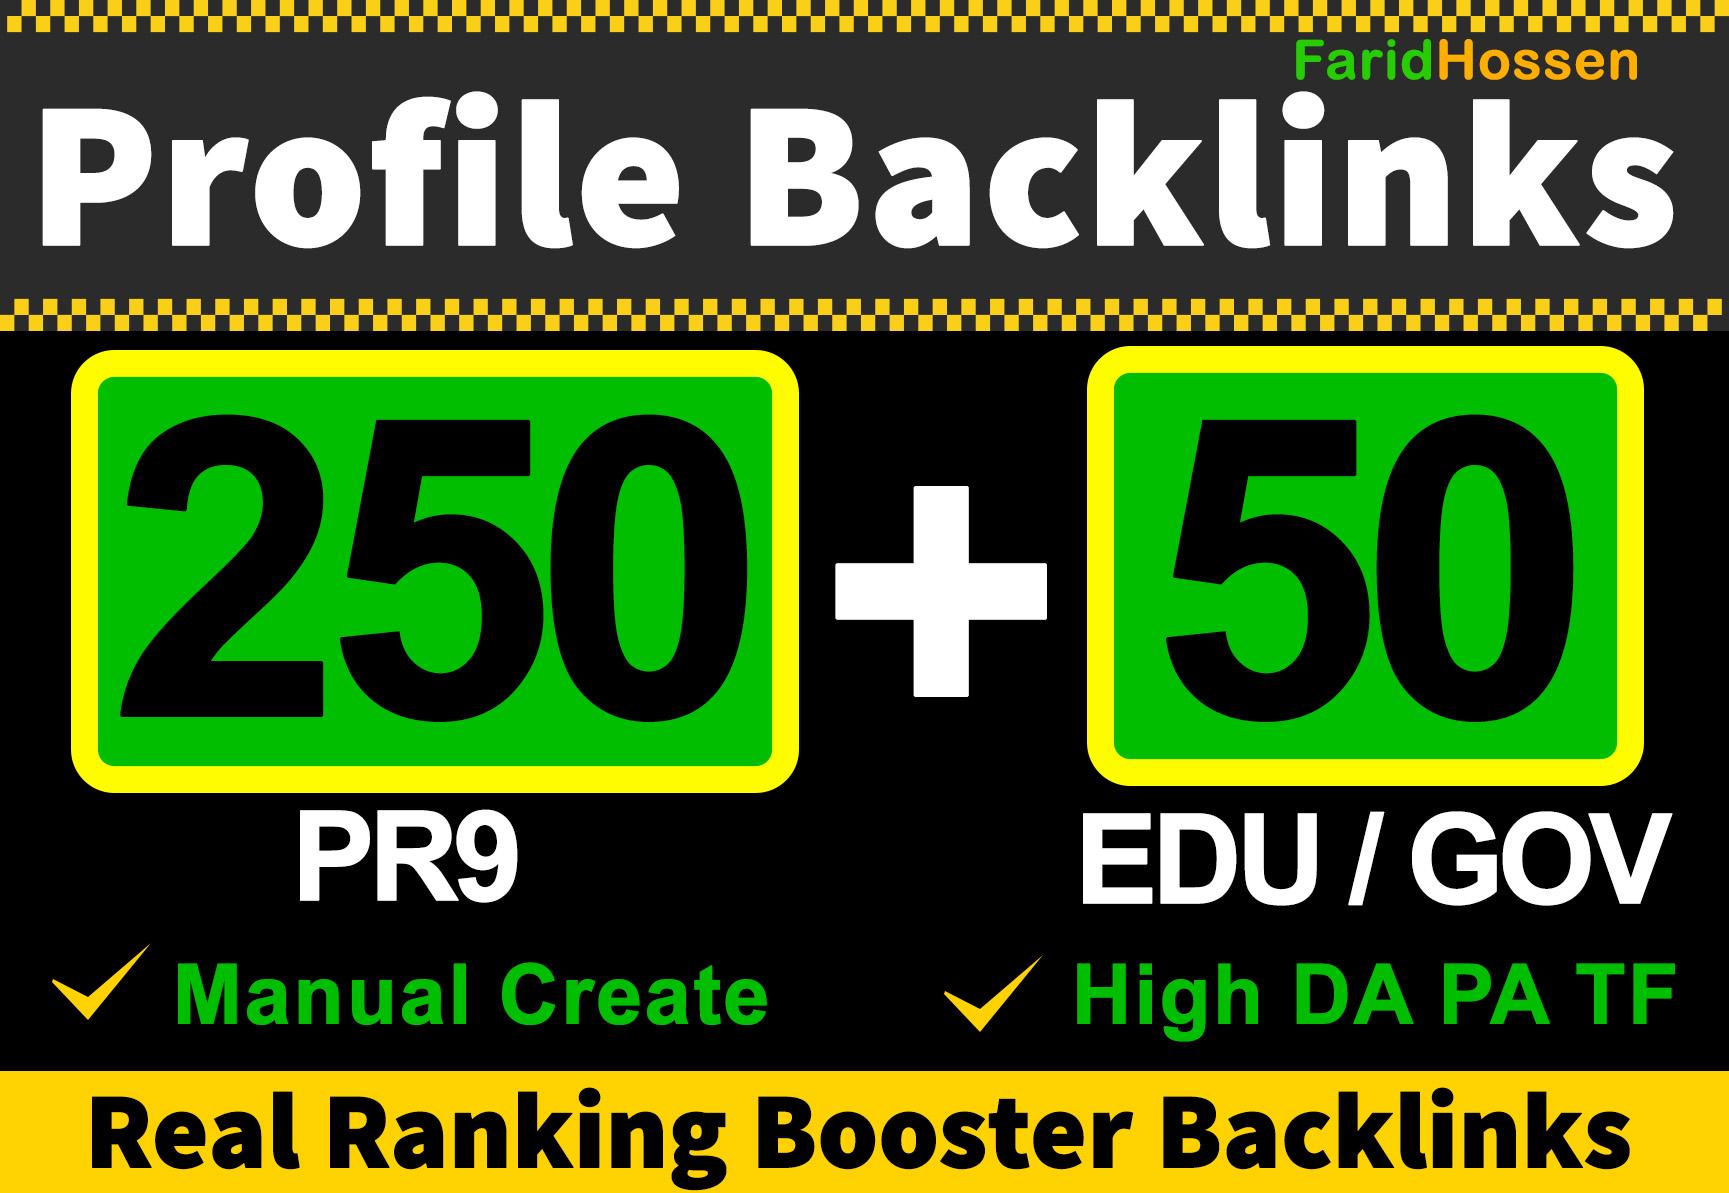 Handmade 250 PR9 + 50 EDU GOV High Authority Profile Backlinks, Real Ranking Booster